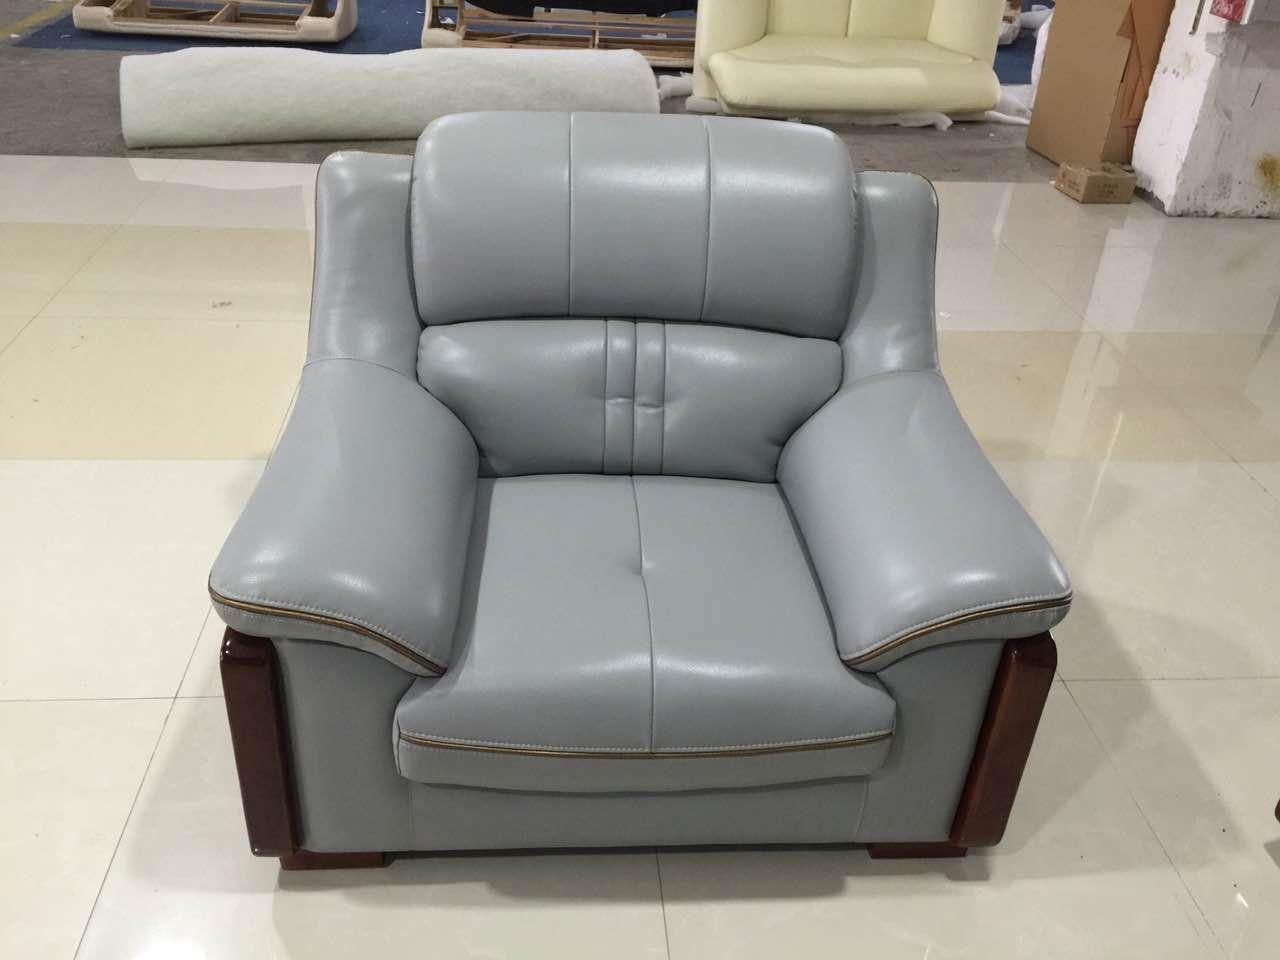 Good Looking Leather Sofa Comfortable One Seater Comfortable Sofa Living Room Sofa Design Modern Sofa Living Room